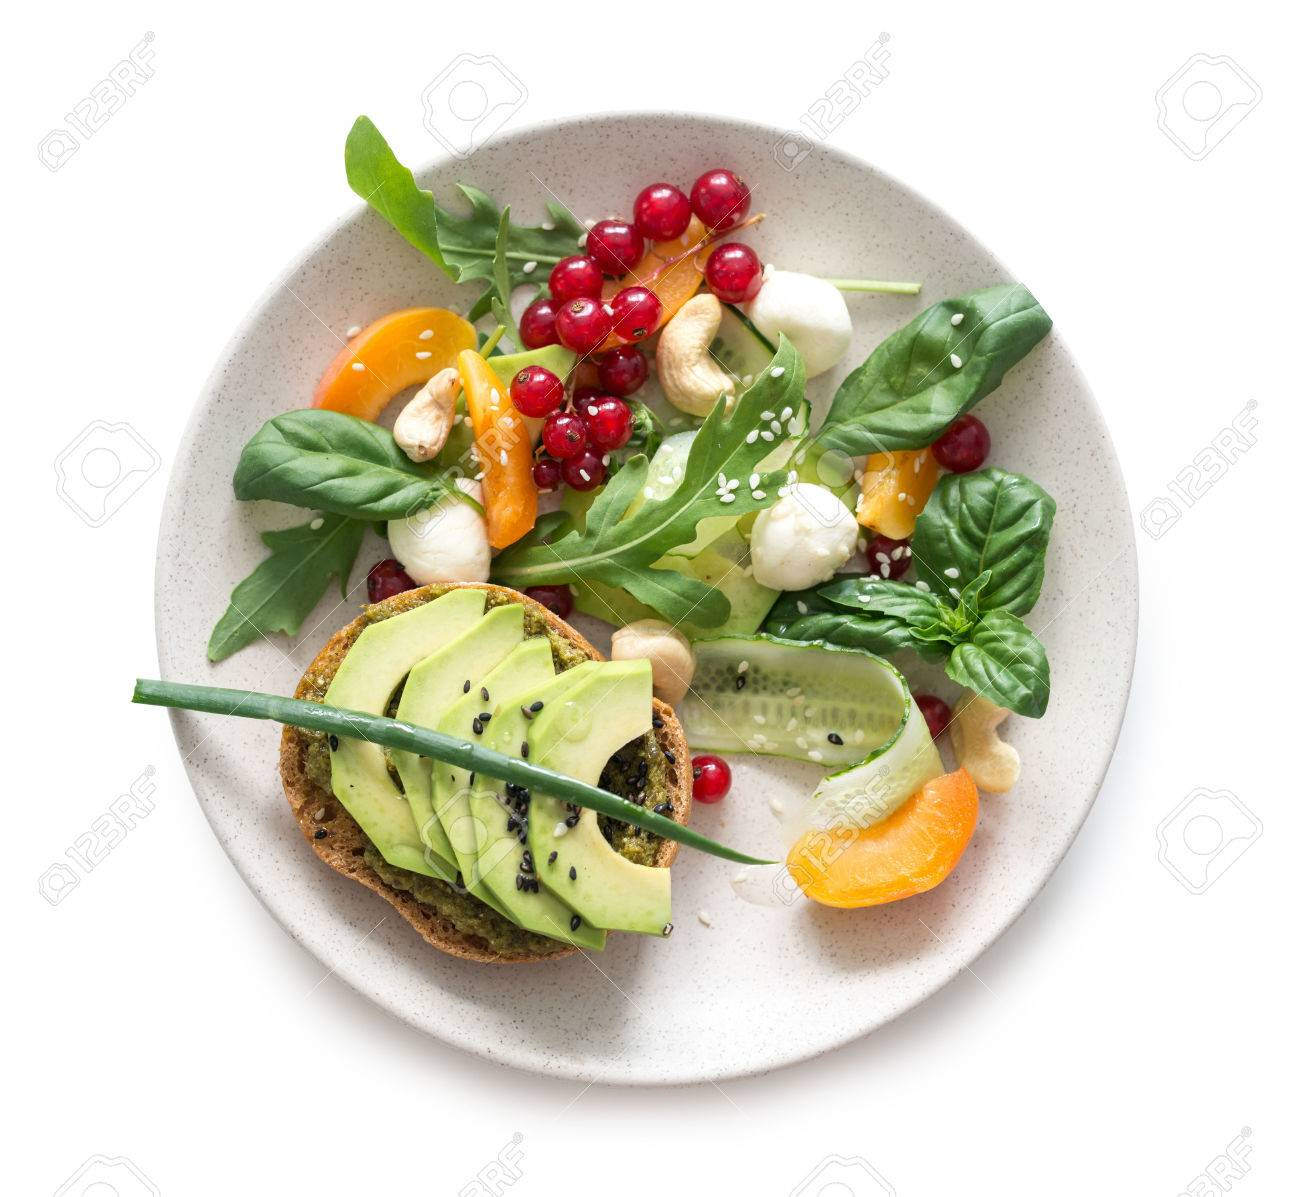 Vegetarian salad isolated - 81852494